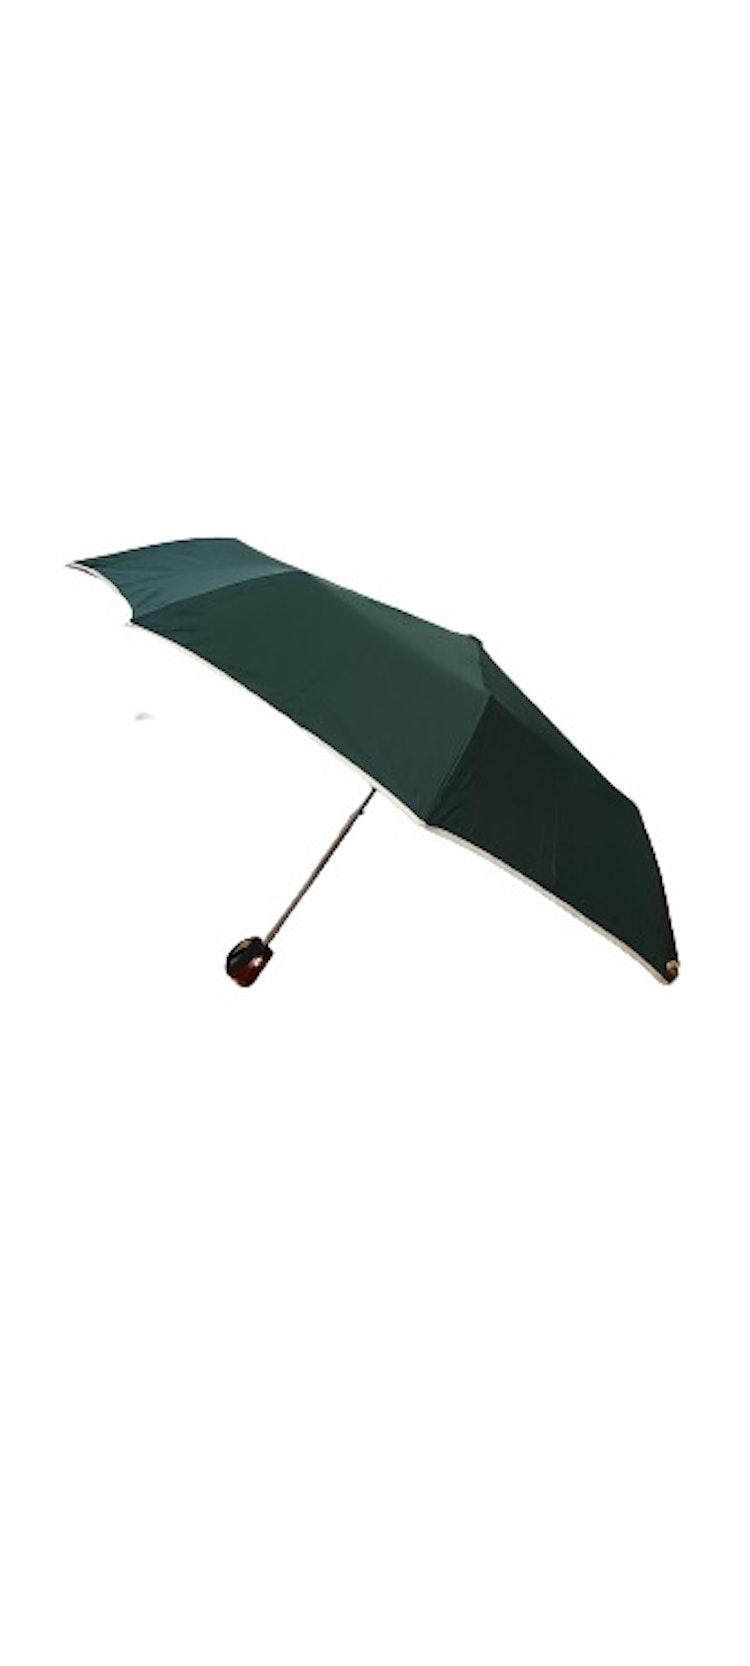 Paraply hopfällbart mossgrönt